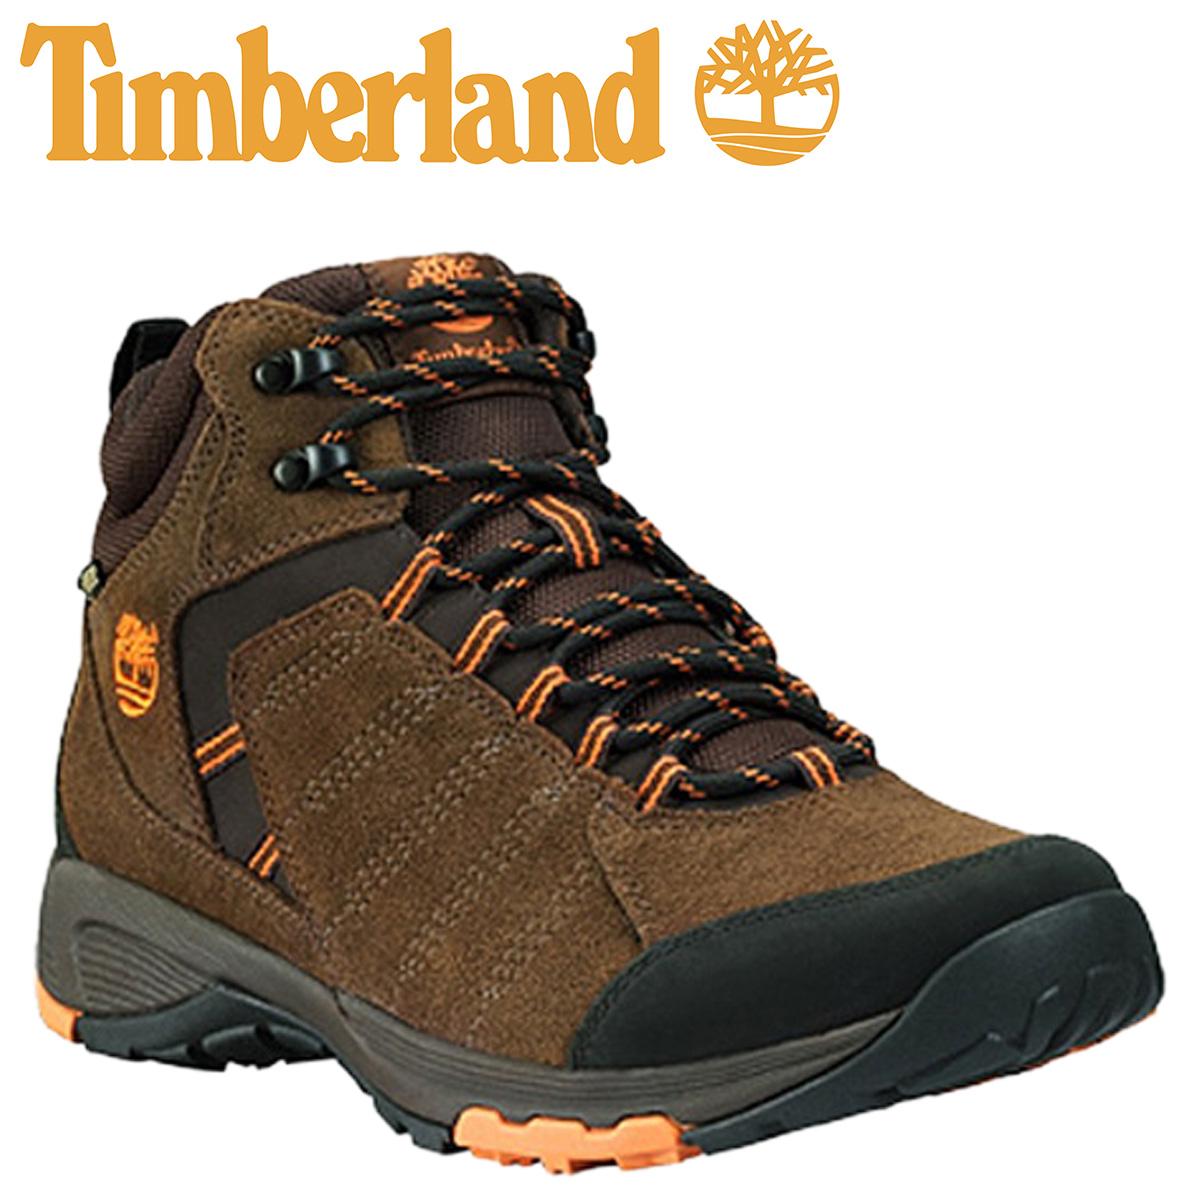 79a6521c3c5 [SOLD OUT] Timberland Timberland Tilton mid Gore-Tex boots TILTON MID  GORE-TEX Gore-Tex 9730R Brown mens